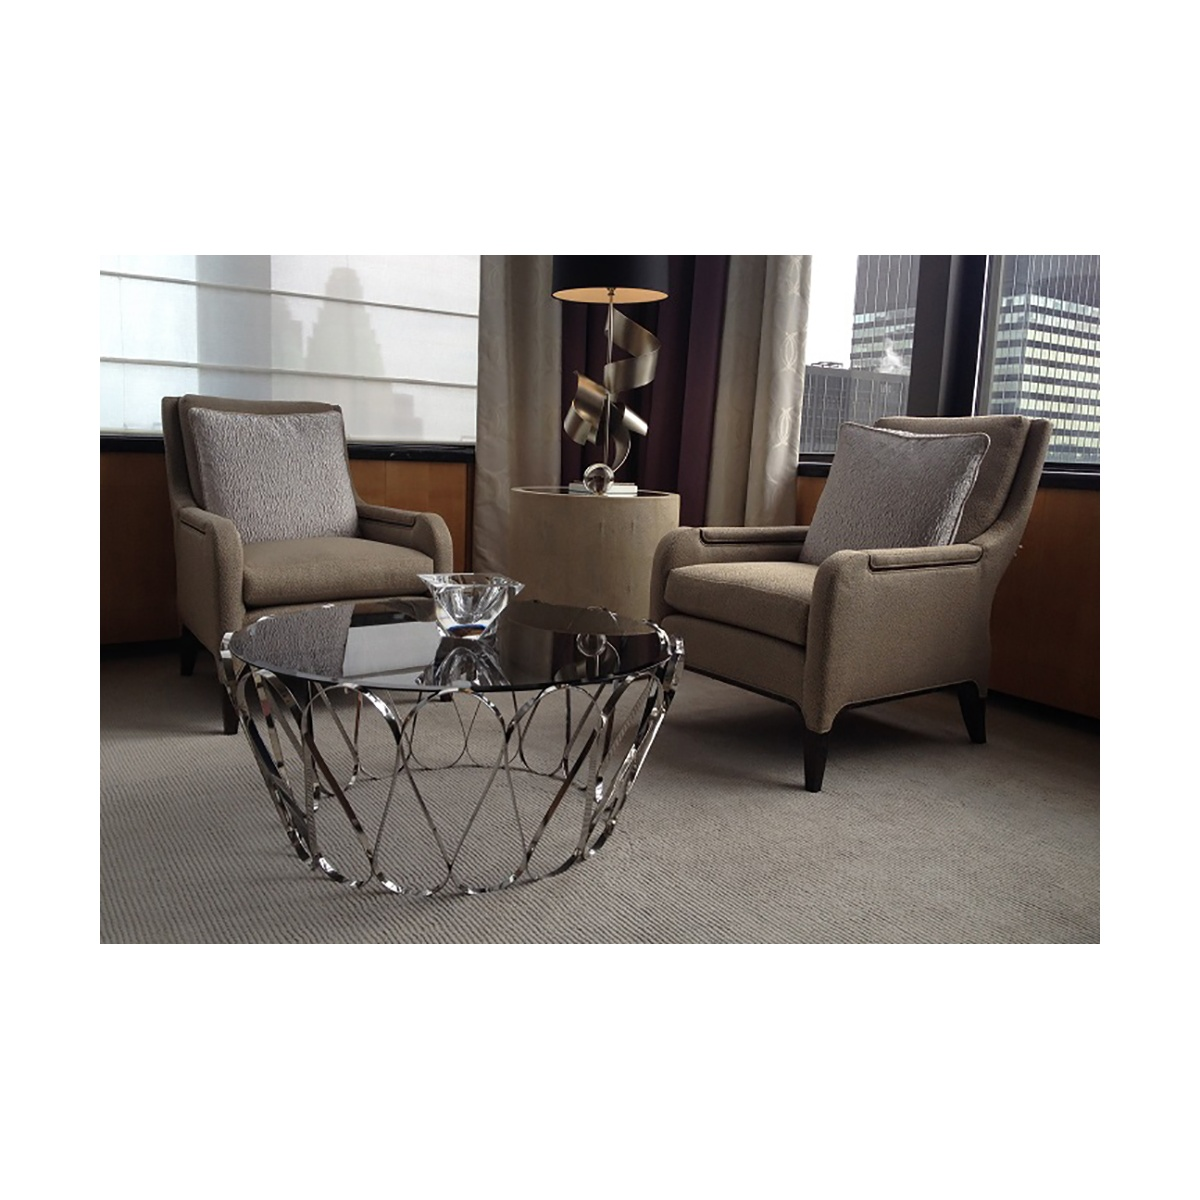 Aquarius Glass Coffee Table, Stainless Steel